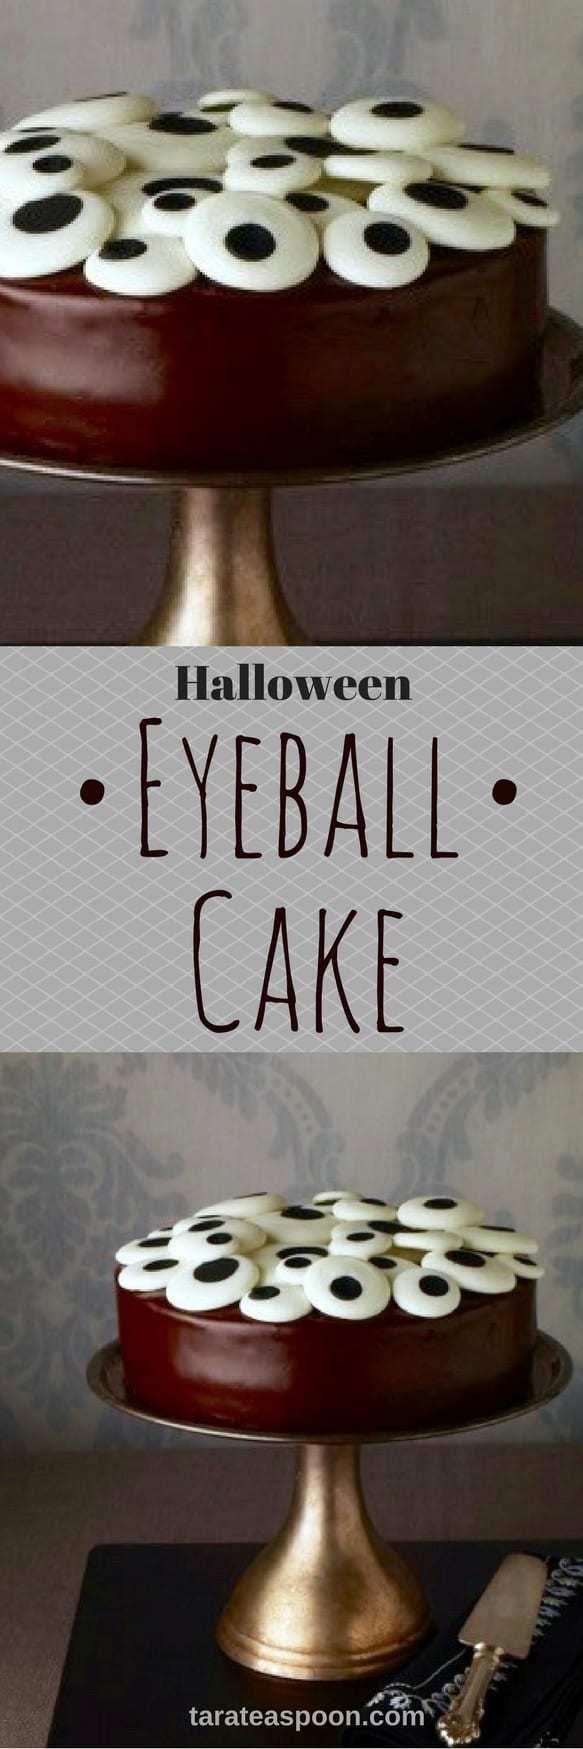 eyeball cake long pin